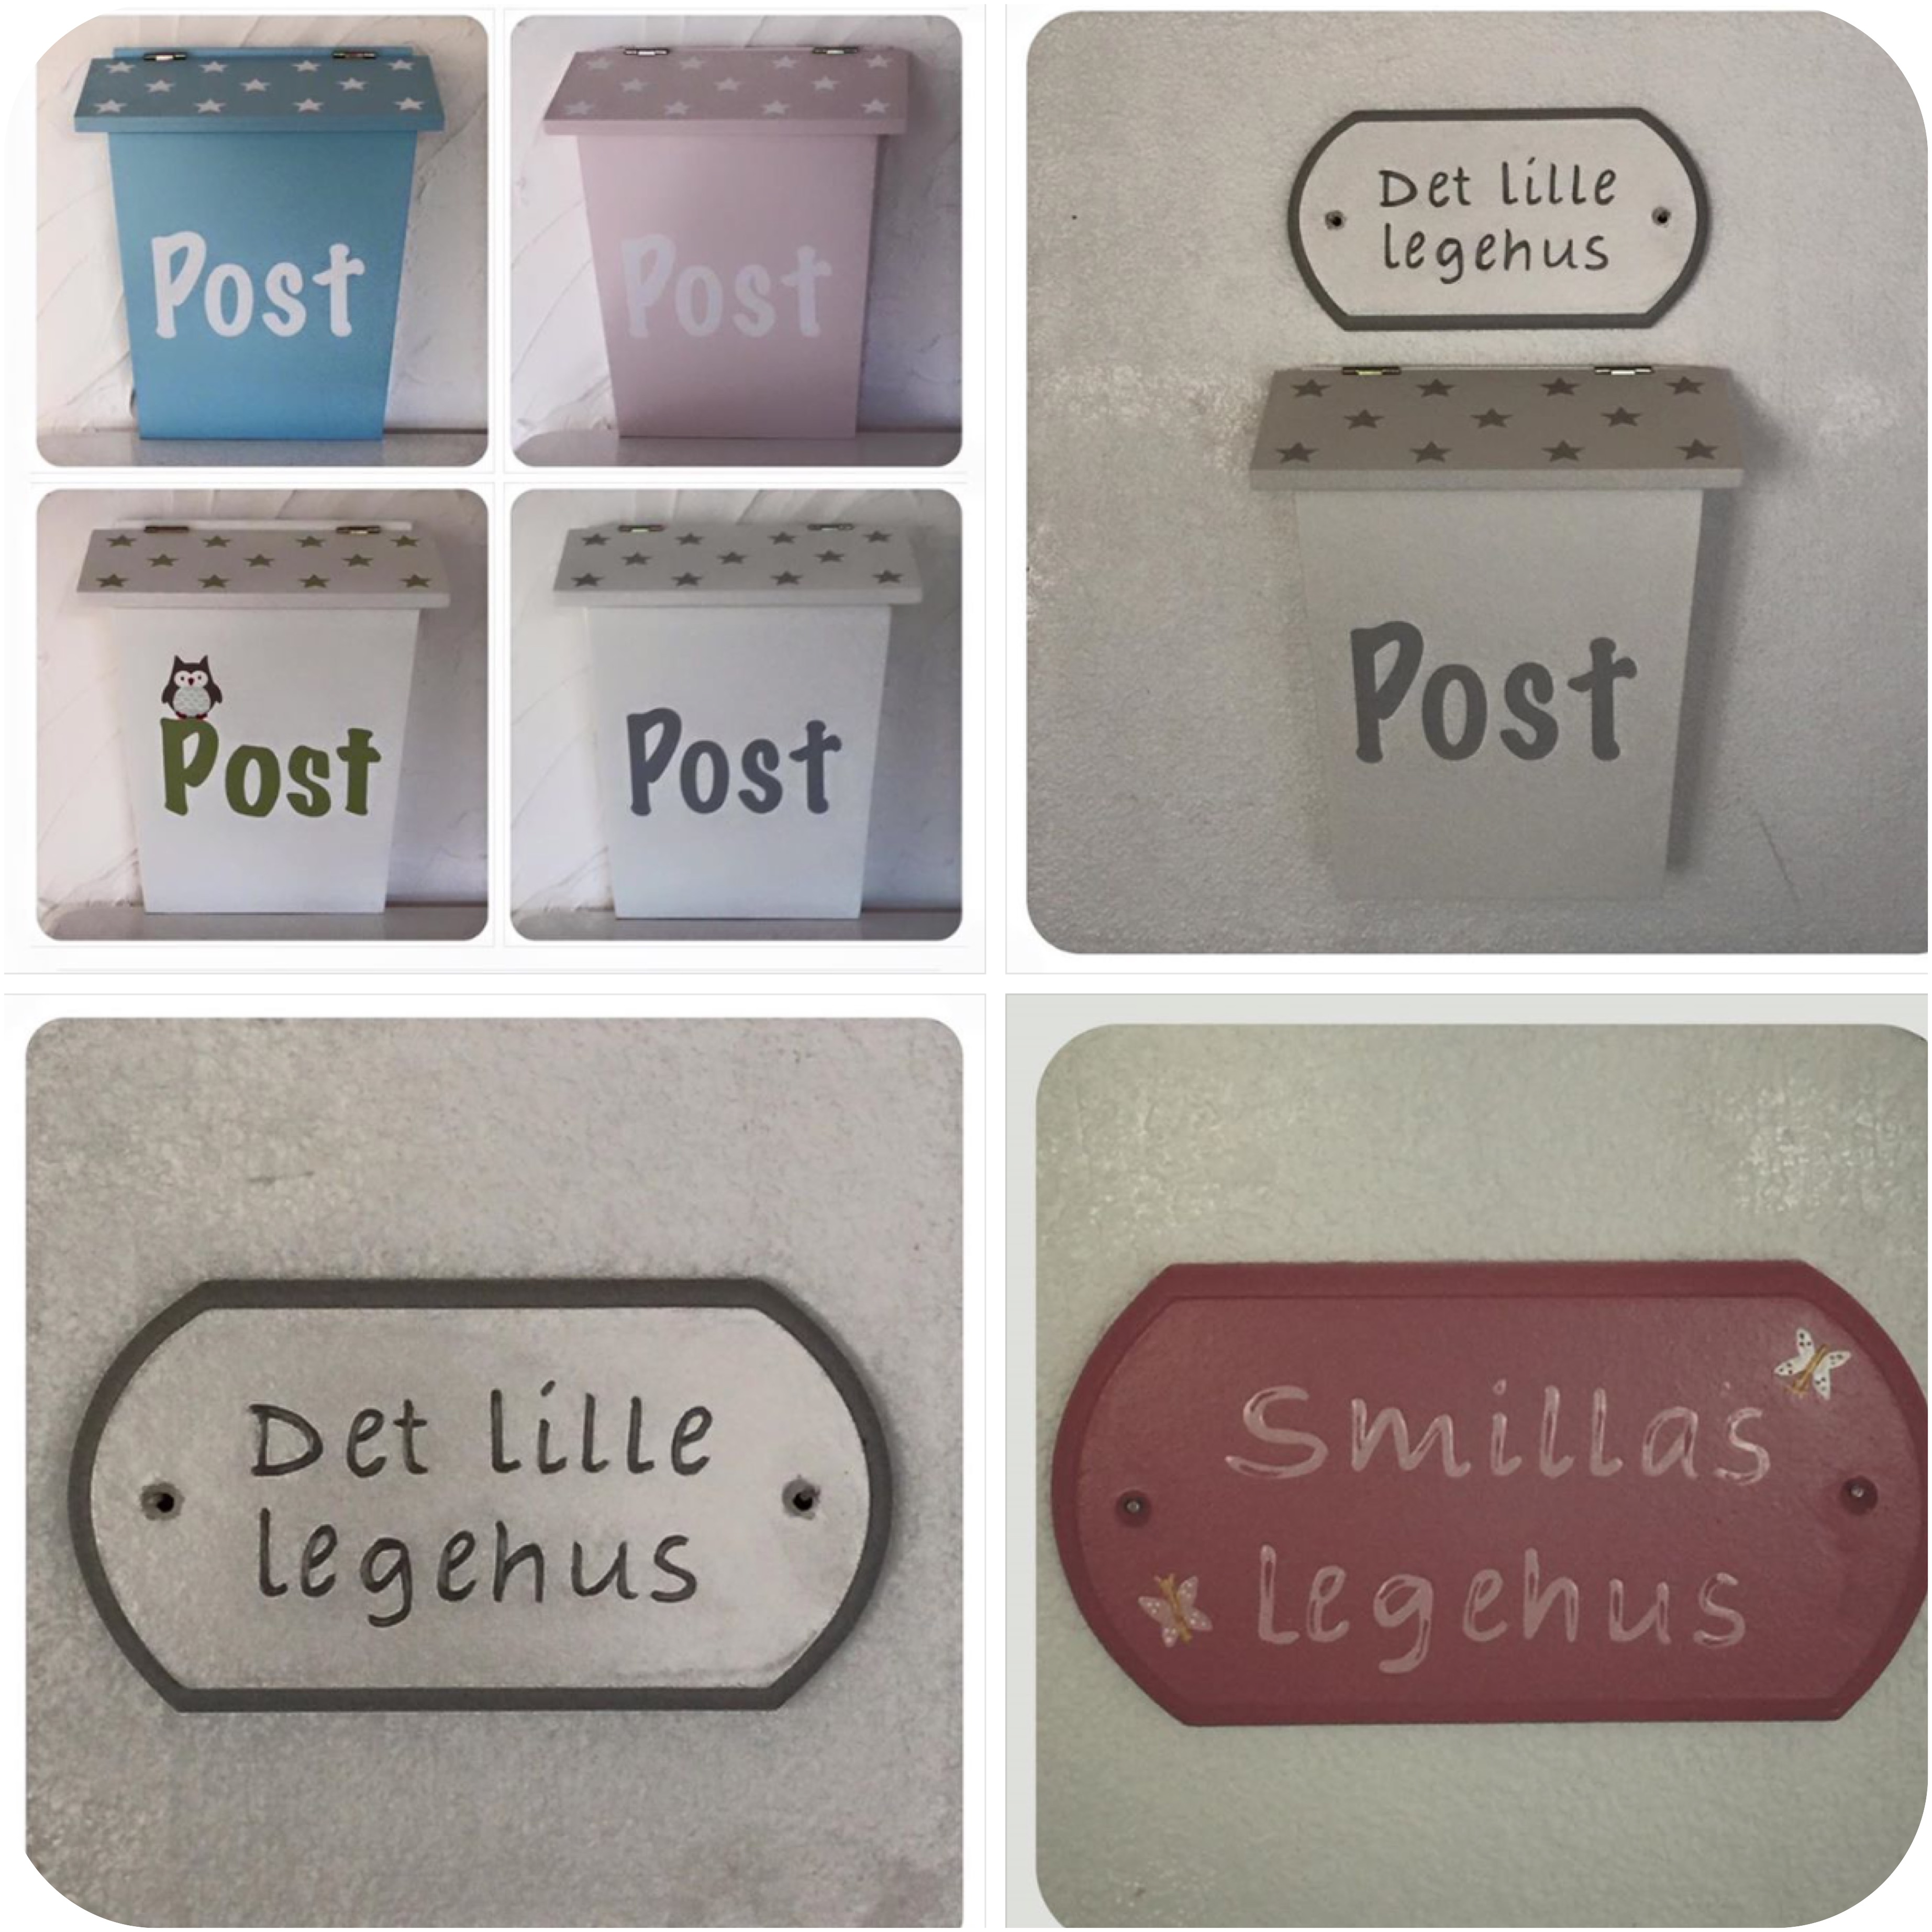 Nye Postkasse hvid – Dukkehuset ZH-41